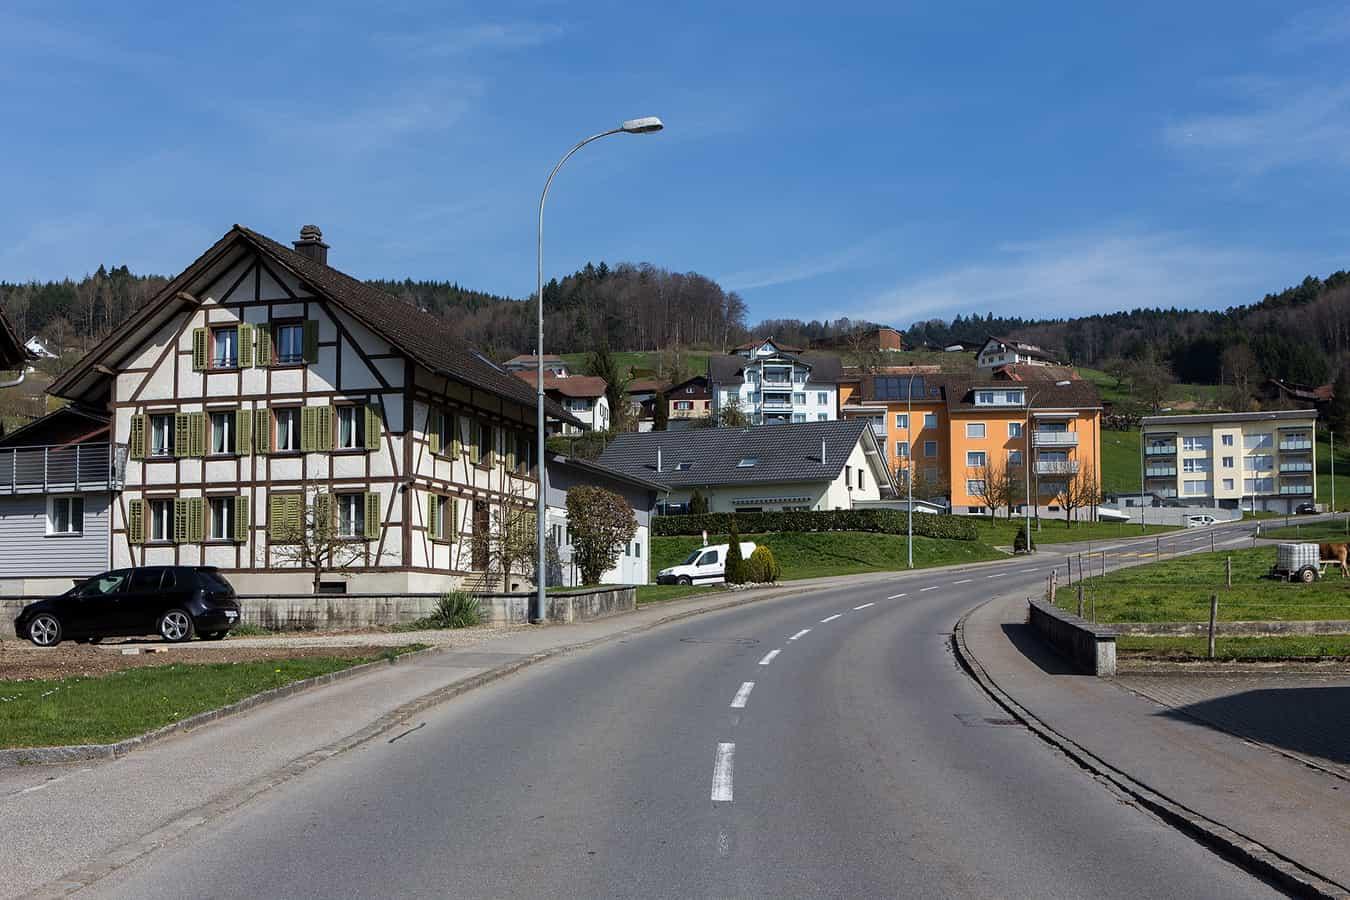 Dorfstrasse in Uffikon